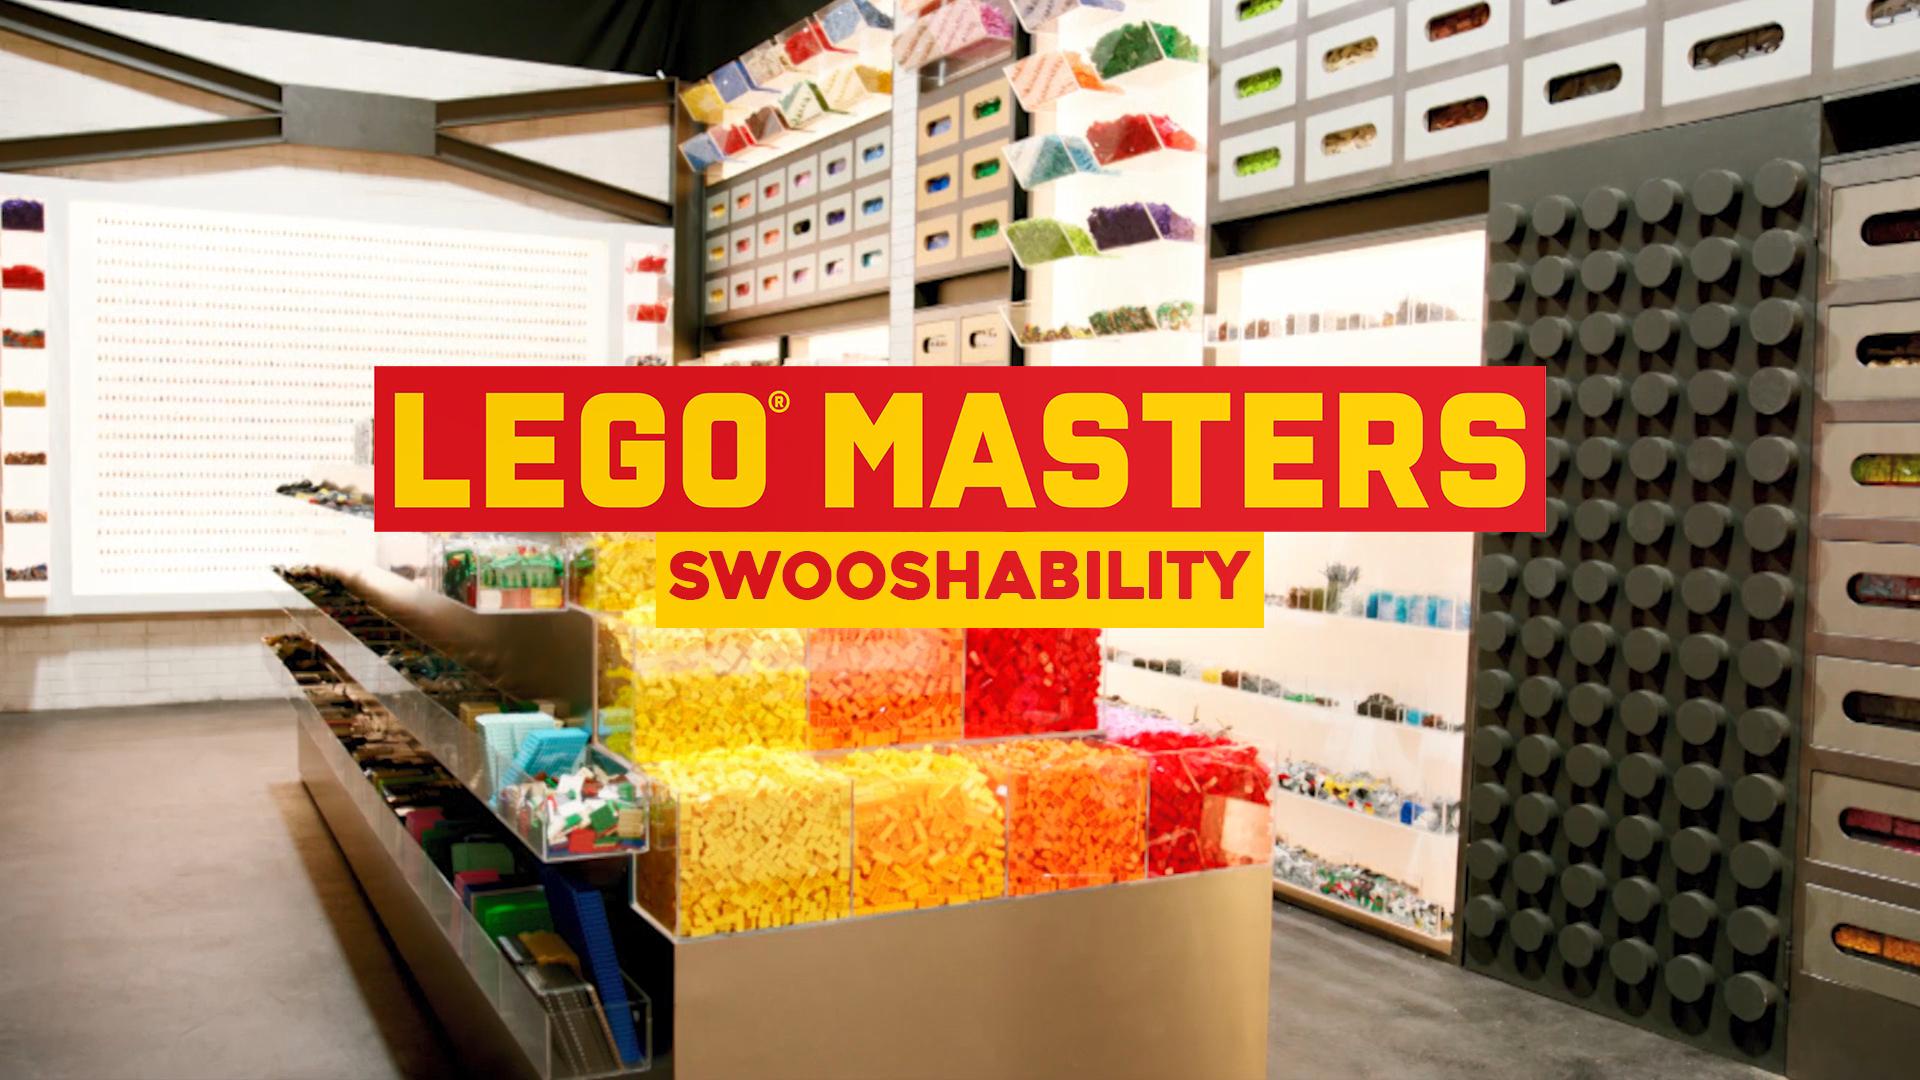 LEGO Tips, Tricks and Hacks: Swooshability